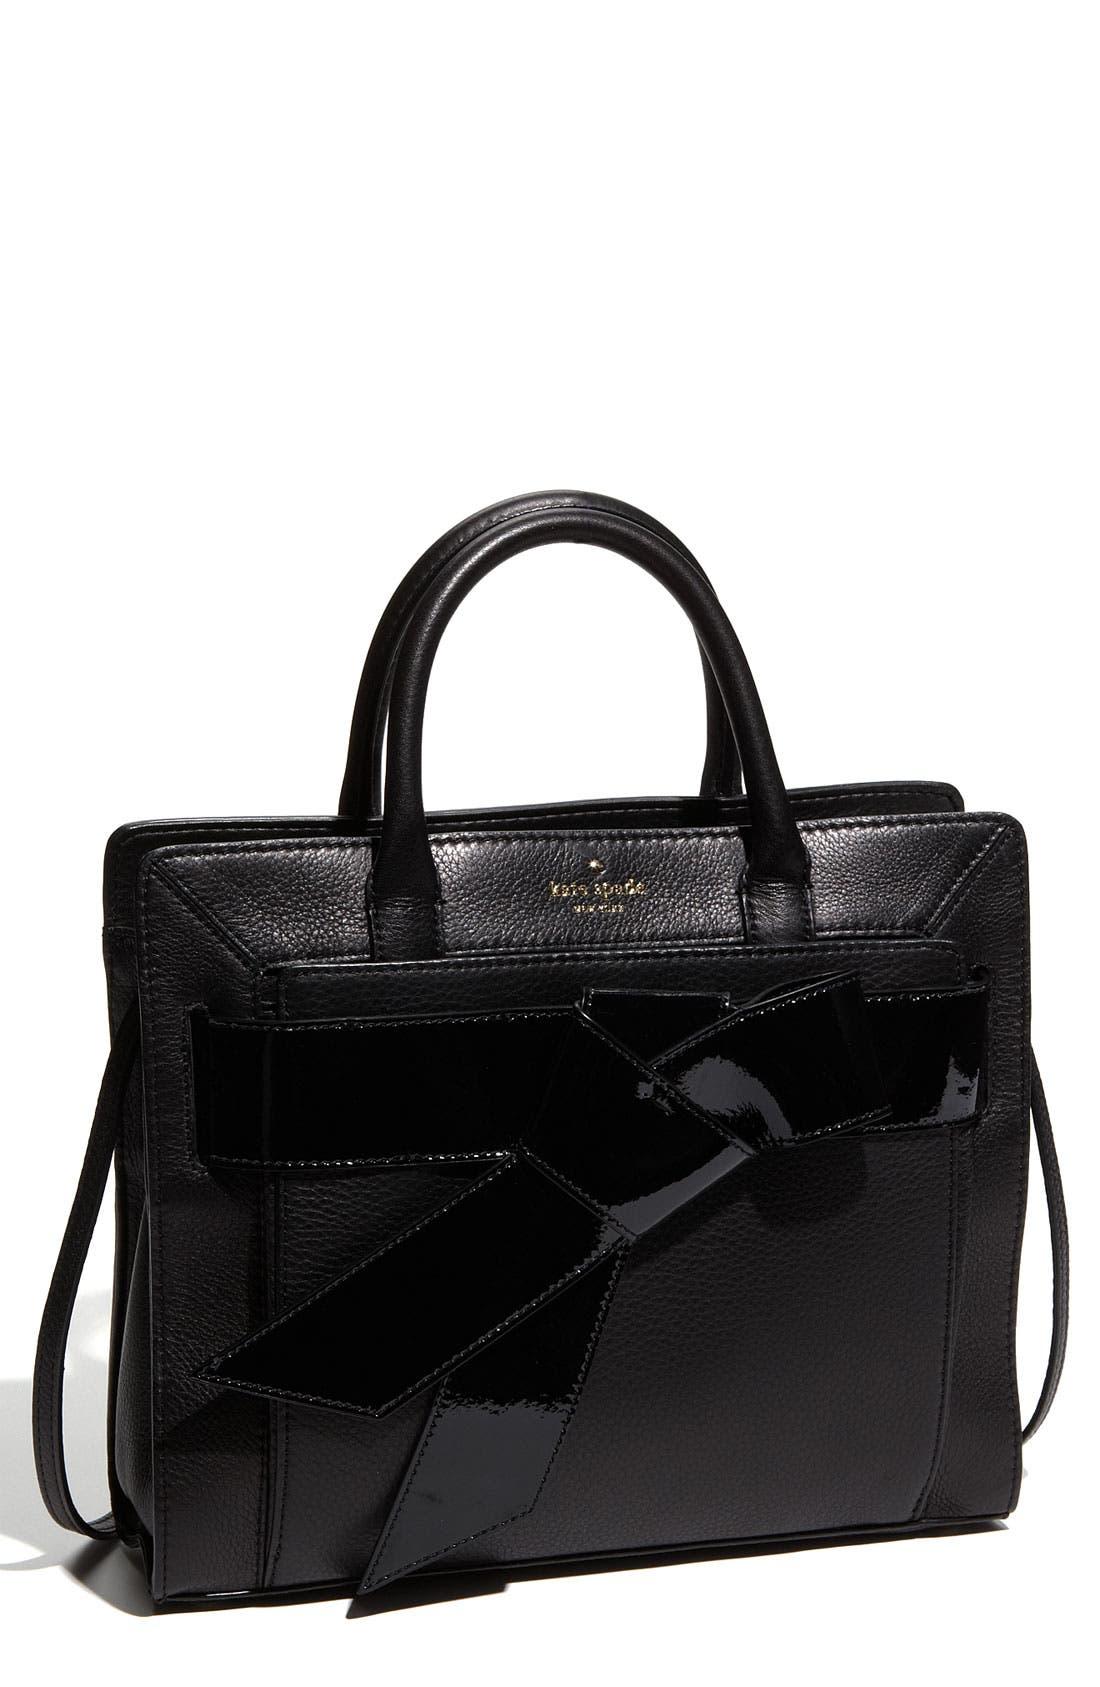 Main Image - kate spade new york 'bow valley - rosa' satchel